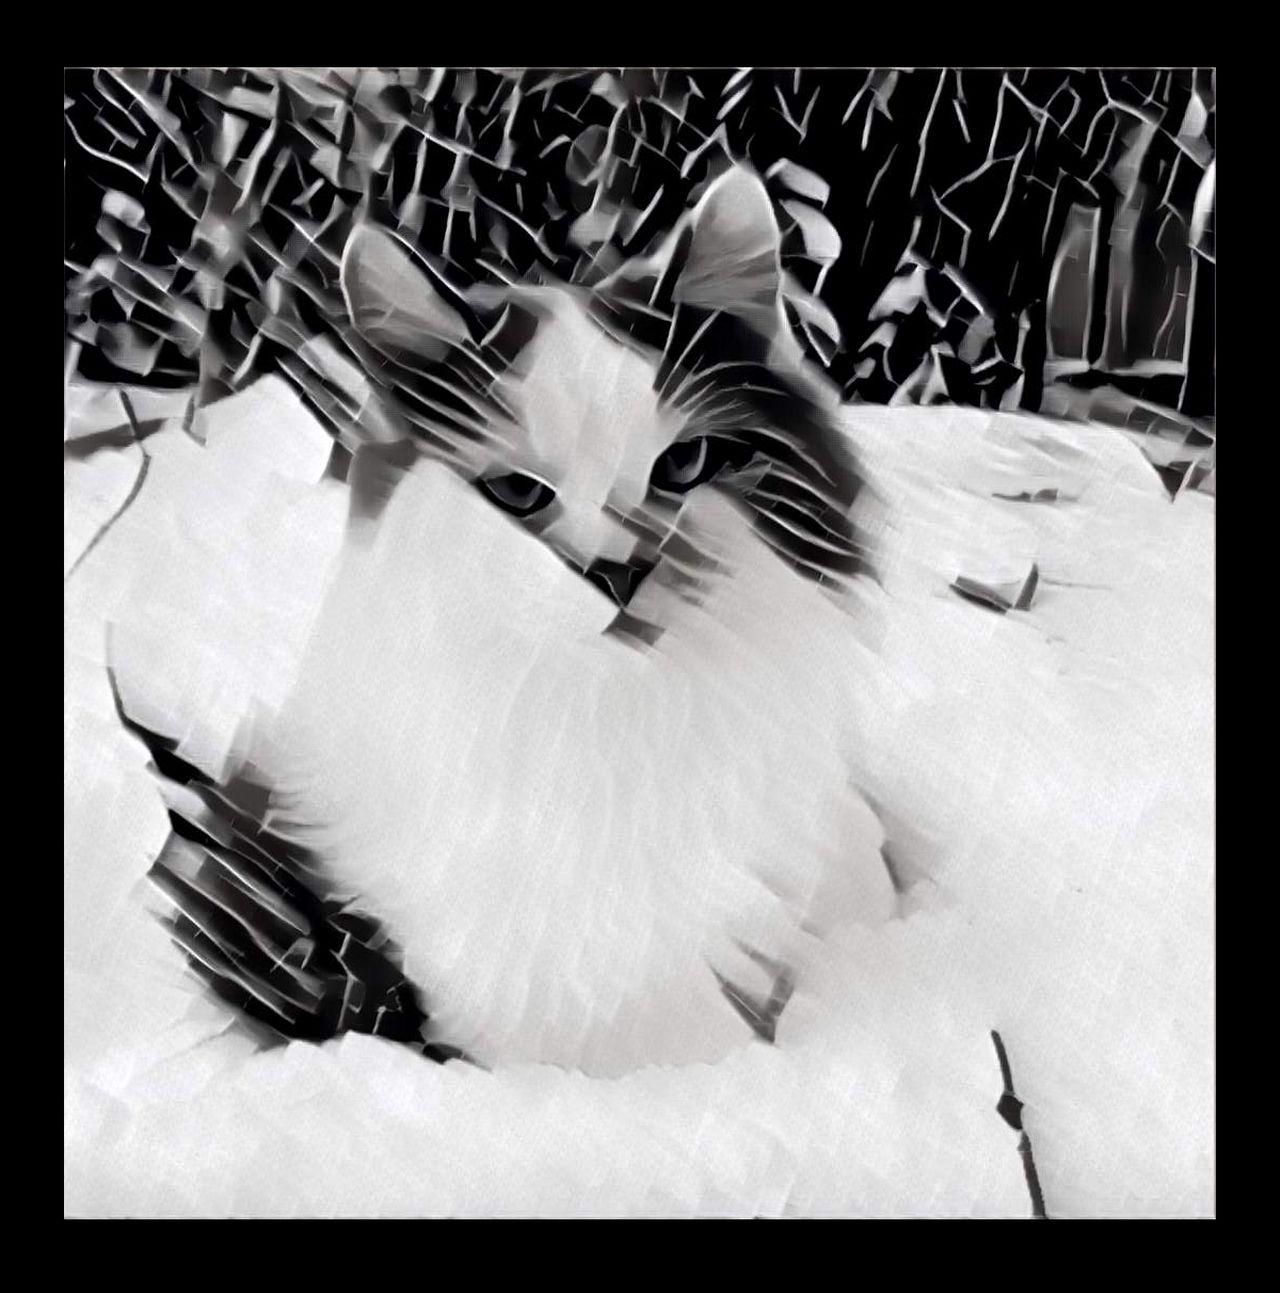 "Это не реклама ""Prisma"", просто я люблю своего котика в любых ипостасях. This is not advertising ""Prisma"", I just love your cat in any forms. Cat Cat Lovers Catlovers Cats Cats Of EyeEm Cats 🐱 Catsofinstagram Cat♡ Close-up Color Color Photography Color Portrait Colors No People One Animal Pets Pets Of Eyeem Prisma Prisma App Prisma Application Prisma Art Prisma Effect Prisma Photo Prisma_Filter Prismacolor"